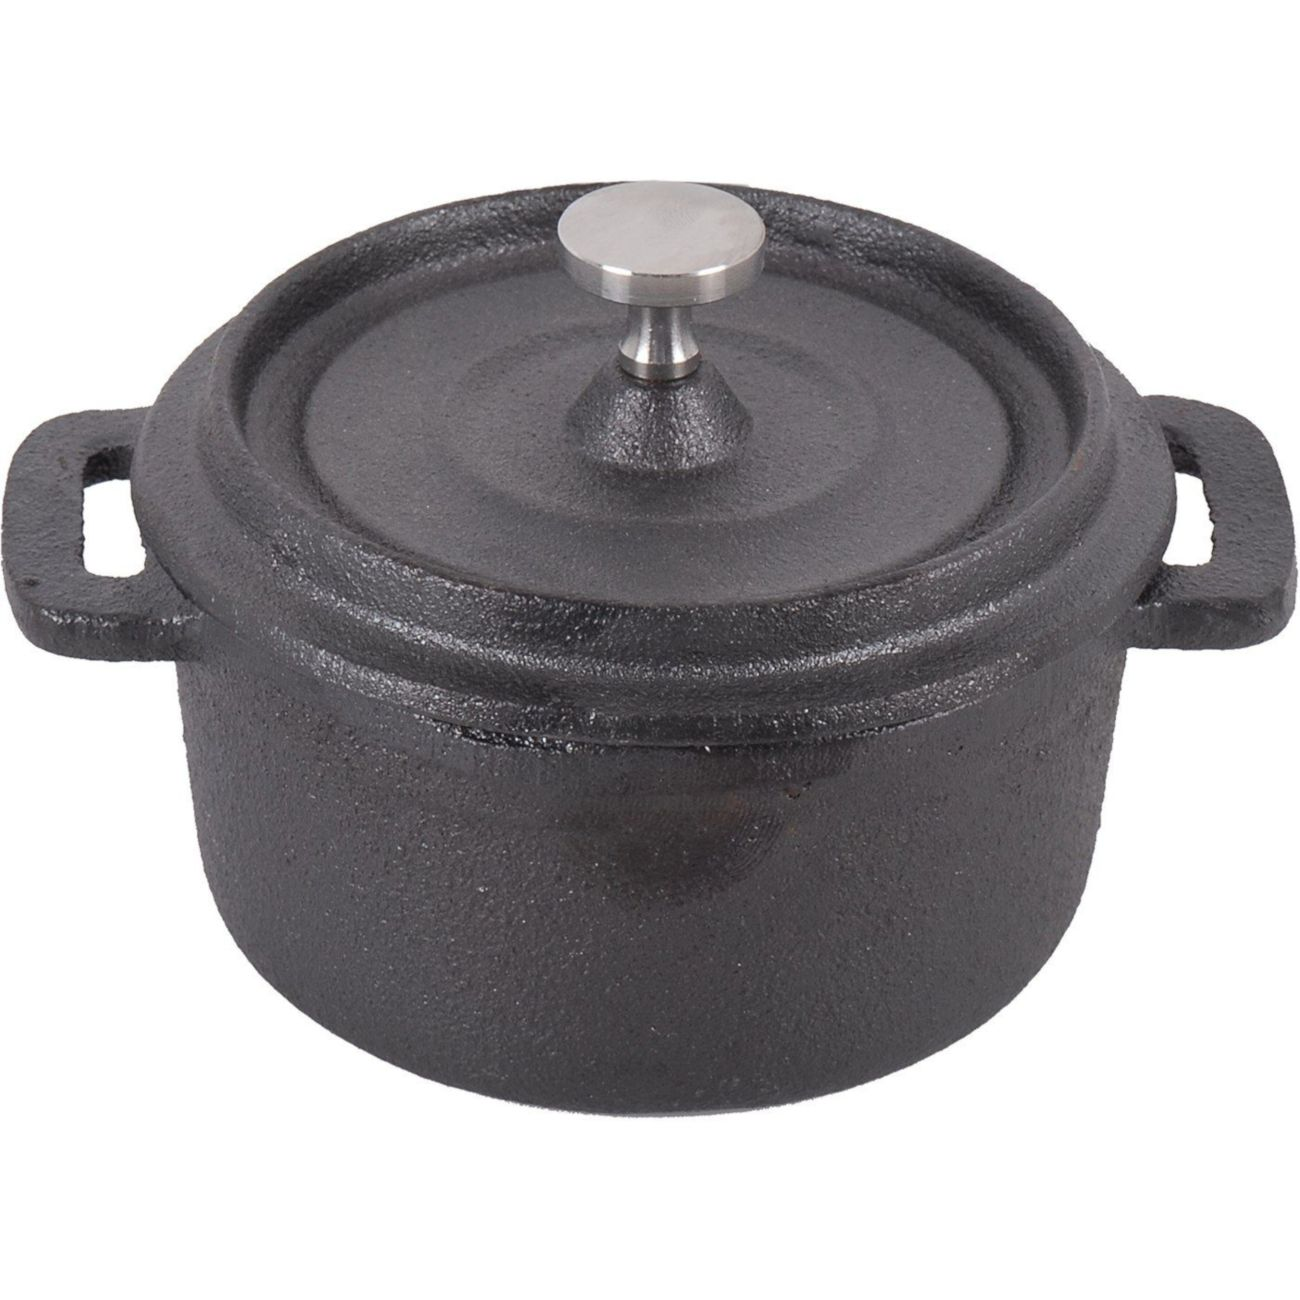 Cook κατσαρόλι μαντεμένιο με καπάκι 10 cm